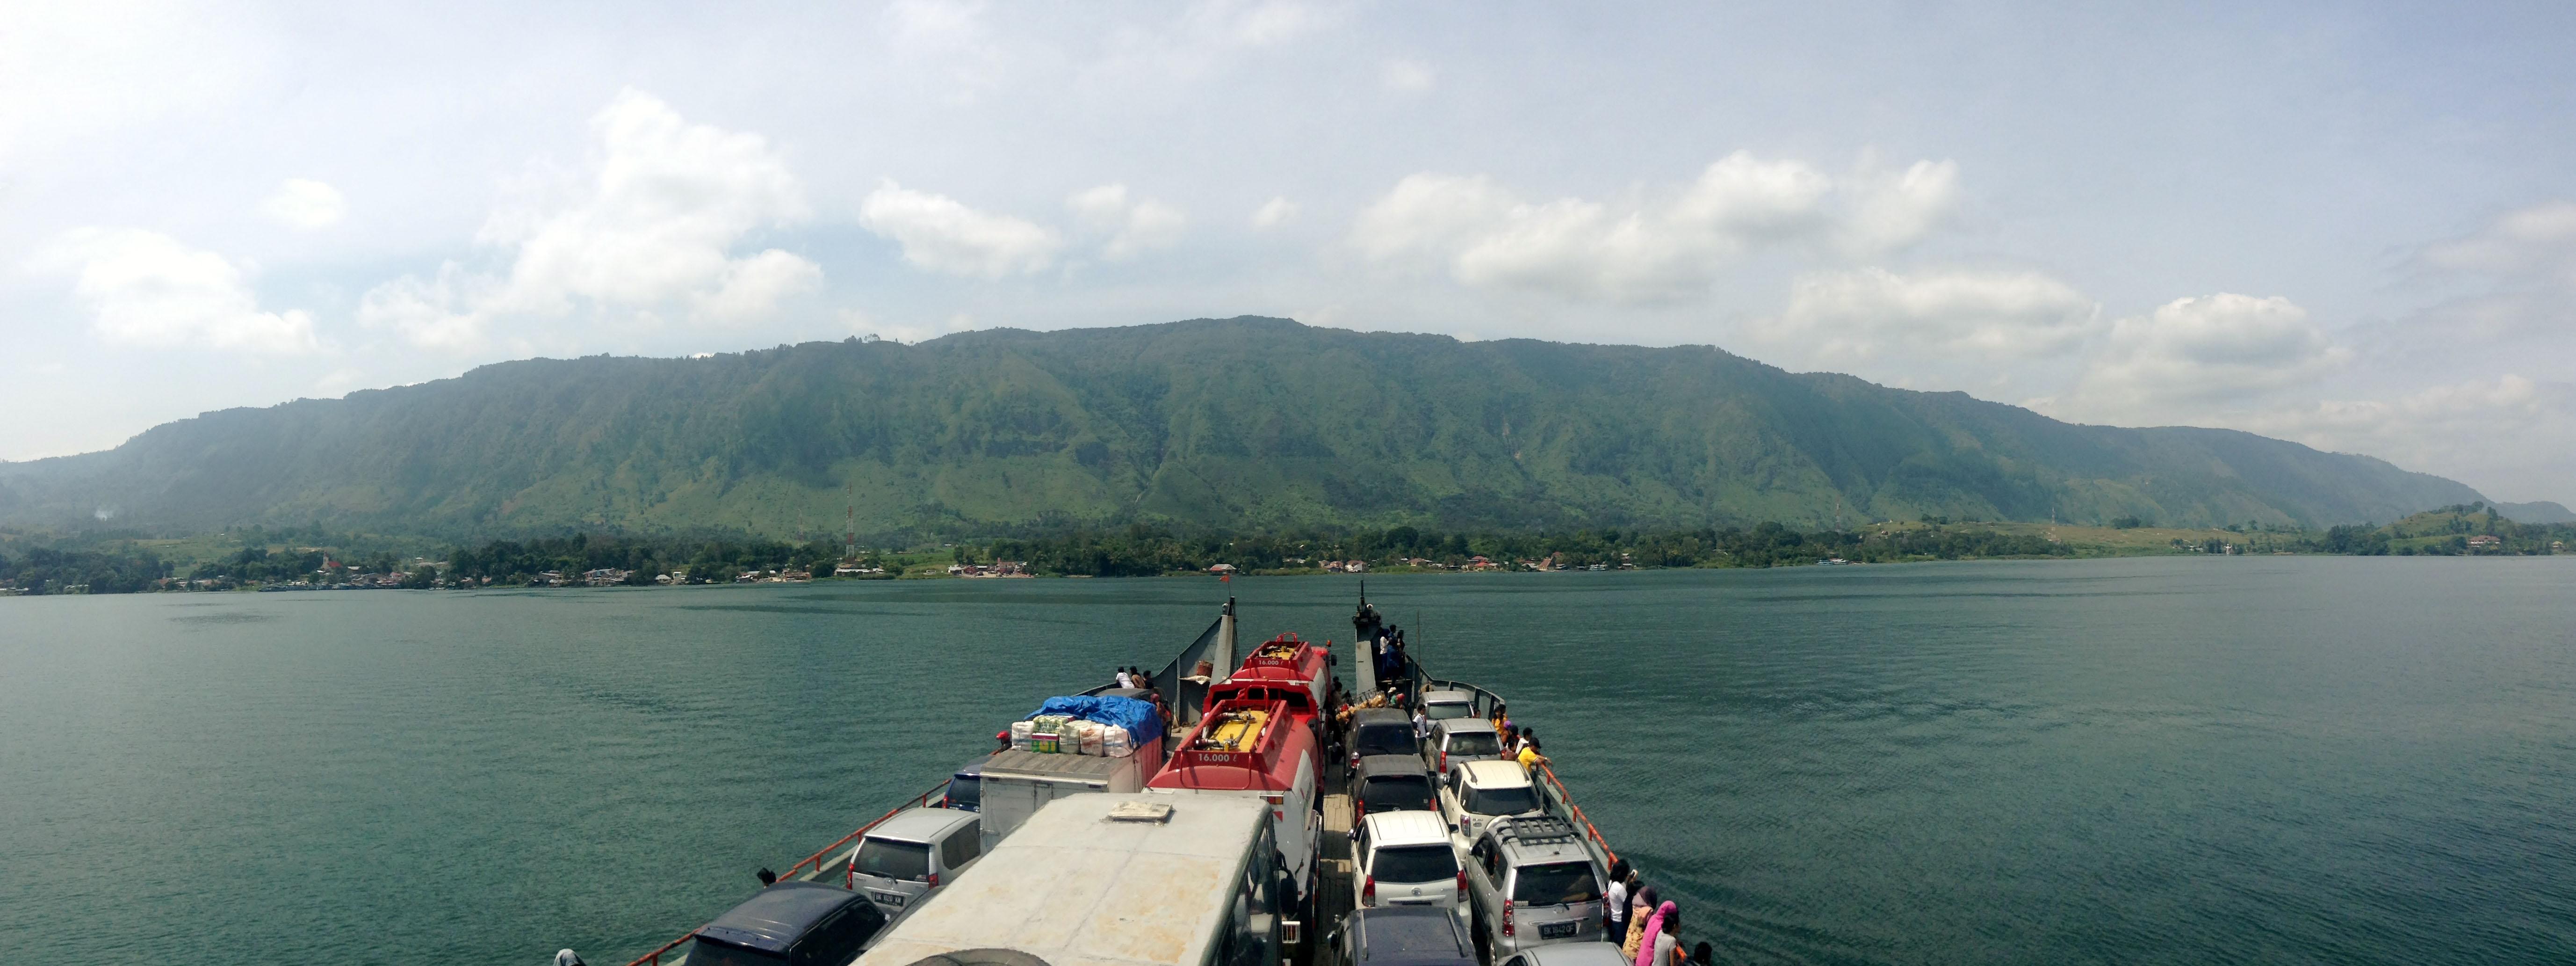 Traveling in Samosir Island, Lake Toba - Michelle Franc ...